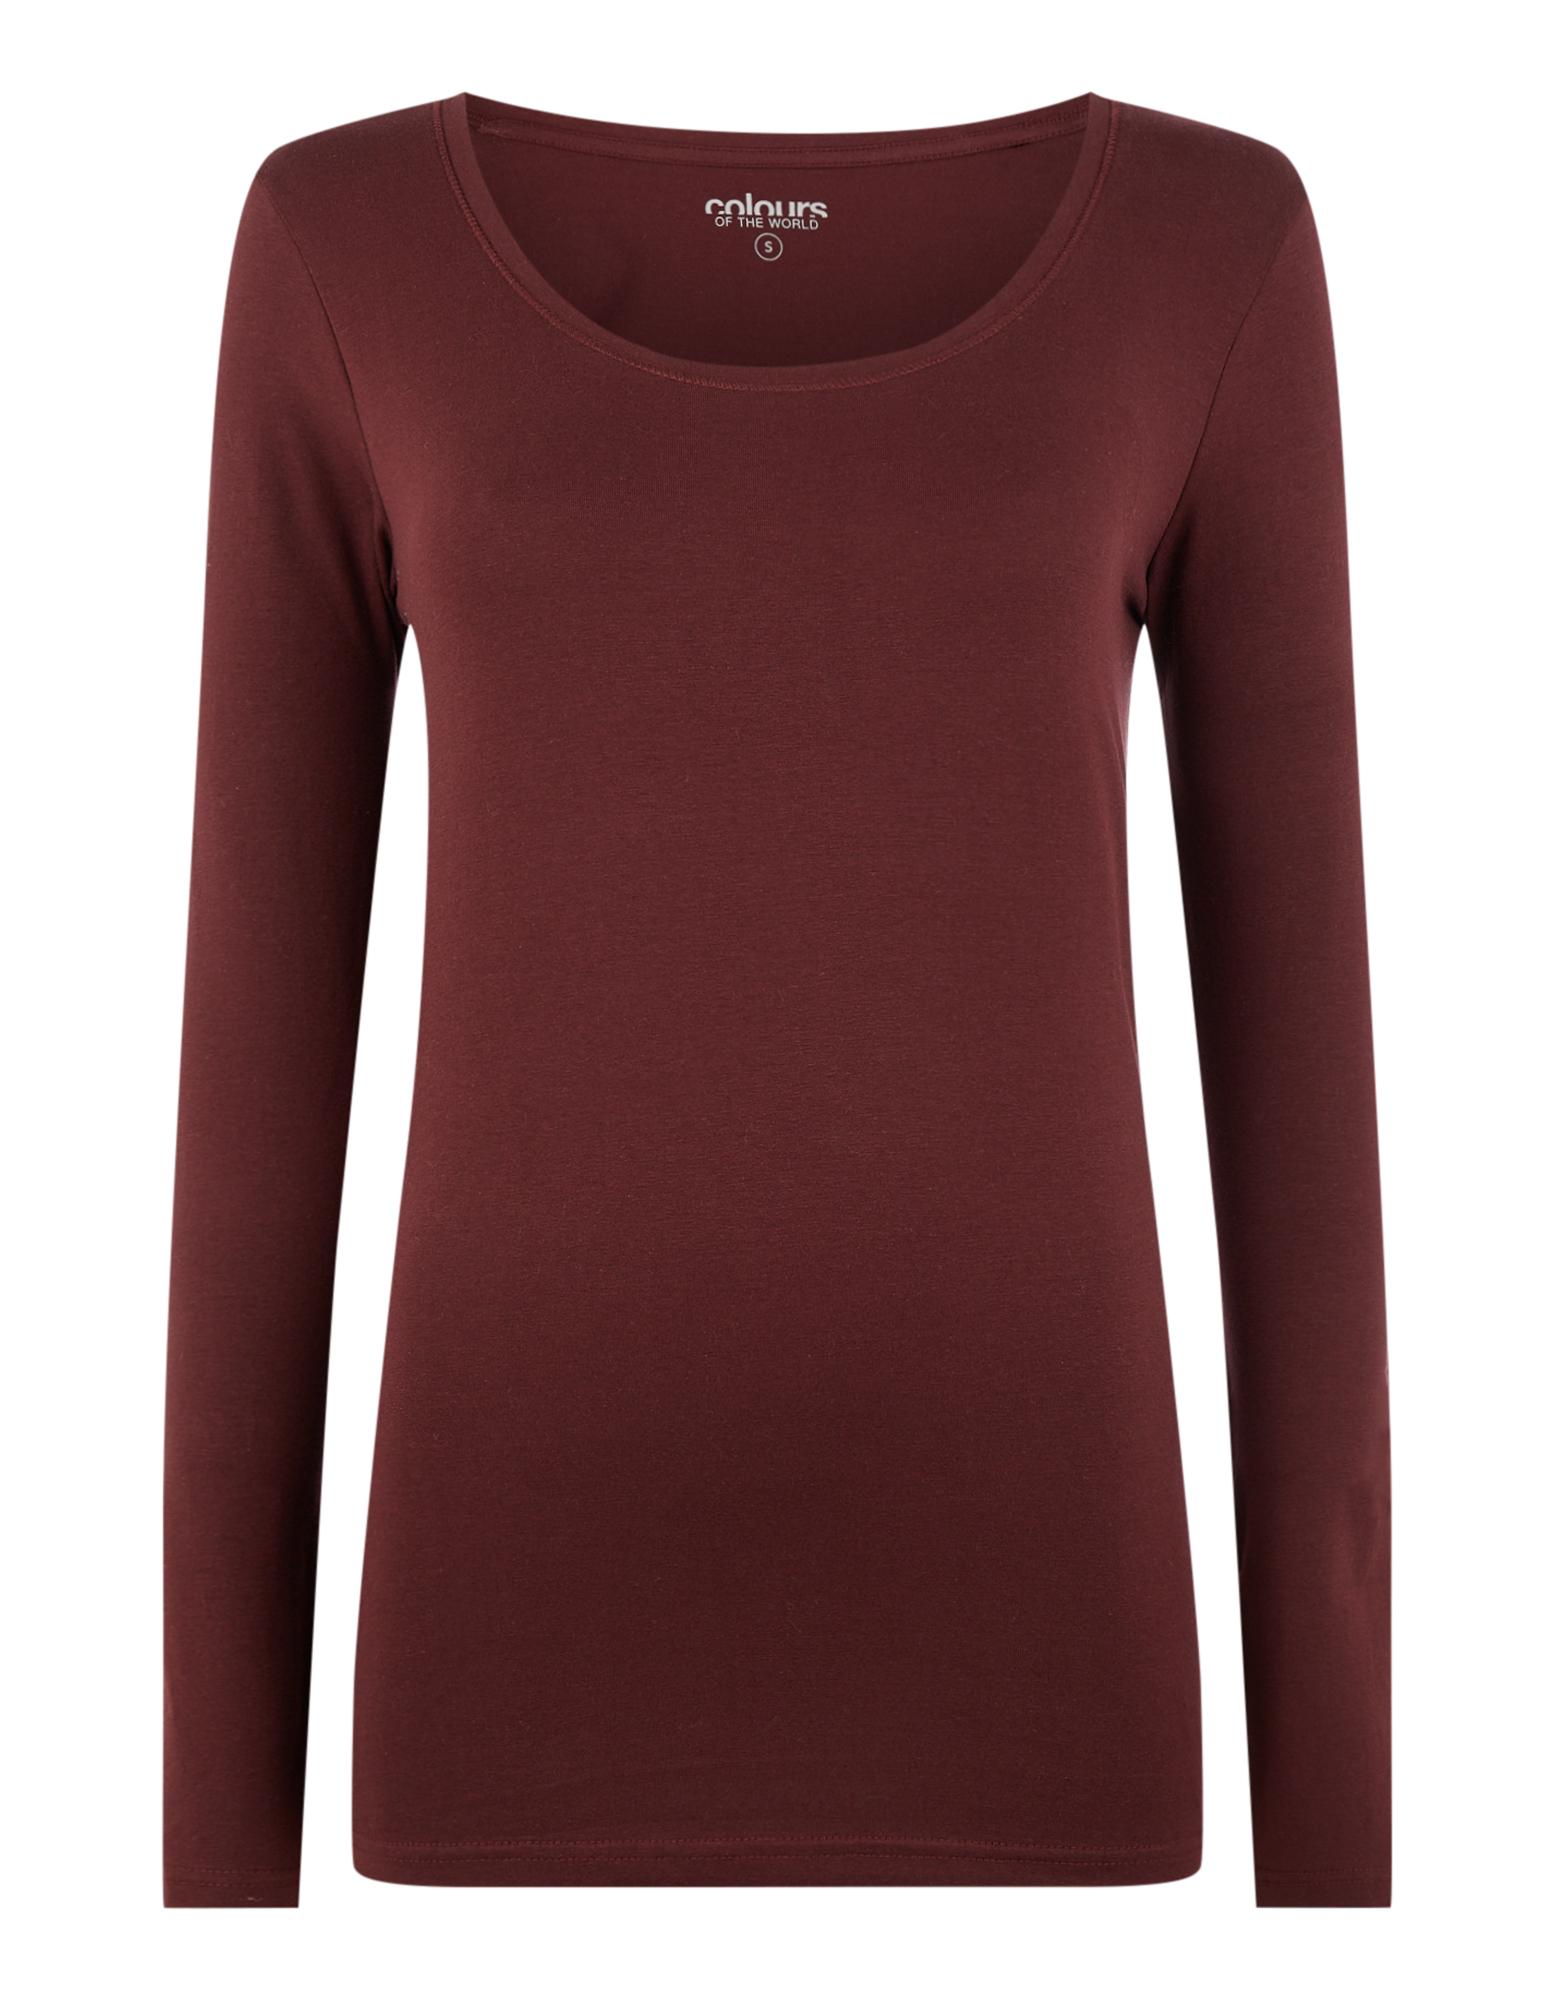 Damen Longsleeve mit Rundhalsausschnitt   Bekleidung > Shirts > Sonstige Shirts   Dunkelrot   Takko